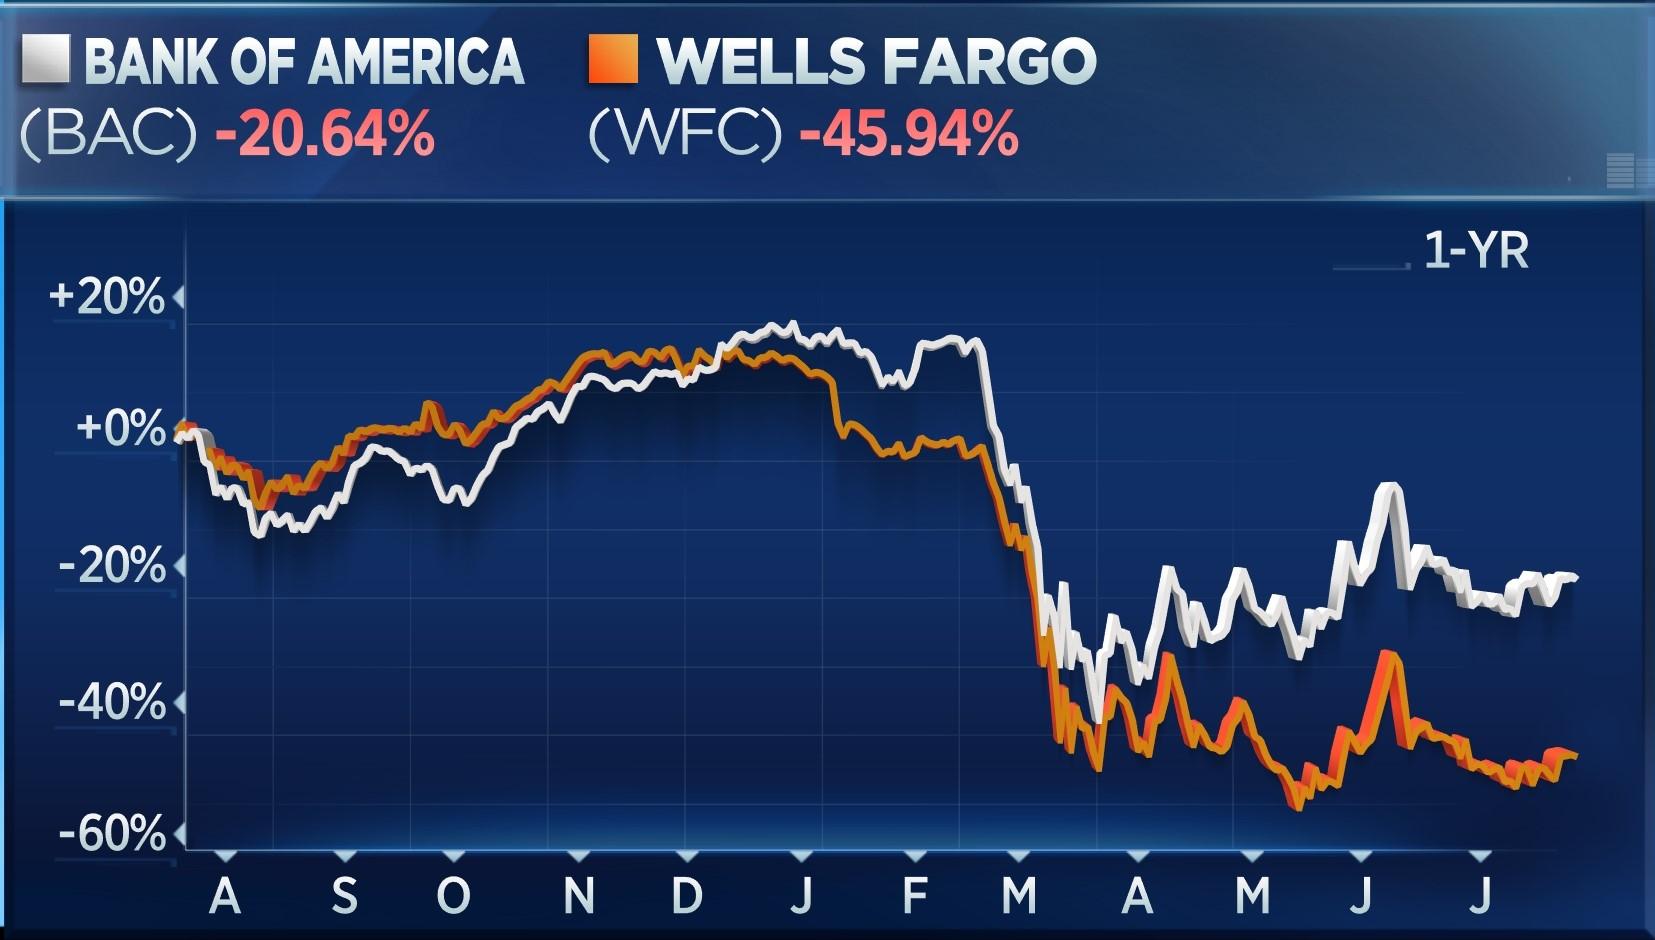 1-year stock chart: Bank of America (BAC) down 20.64%, Wells Fargo (WFC) down 45.94%